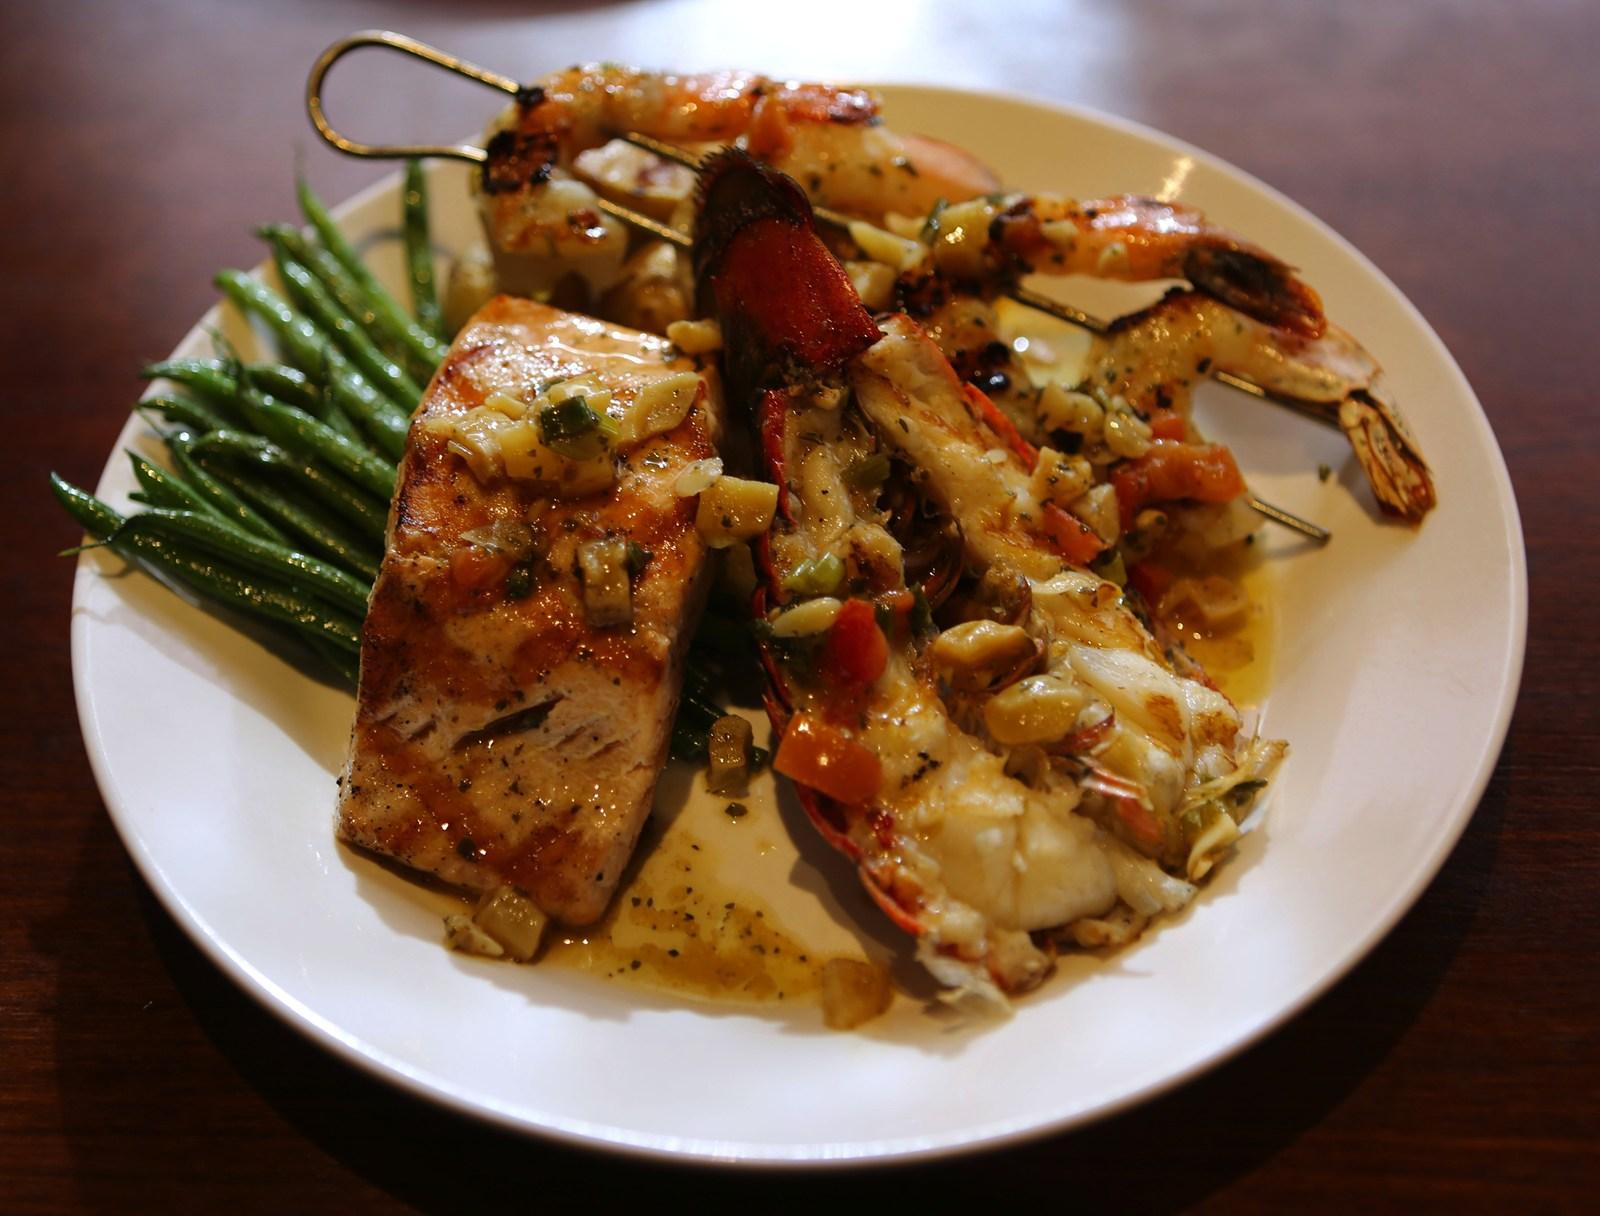 Darden, Red Lobster decry slave-labor allegations in Asia - Orlando ...